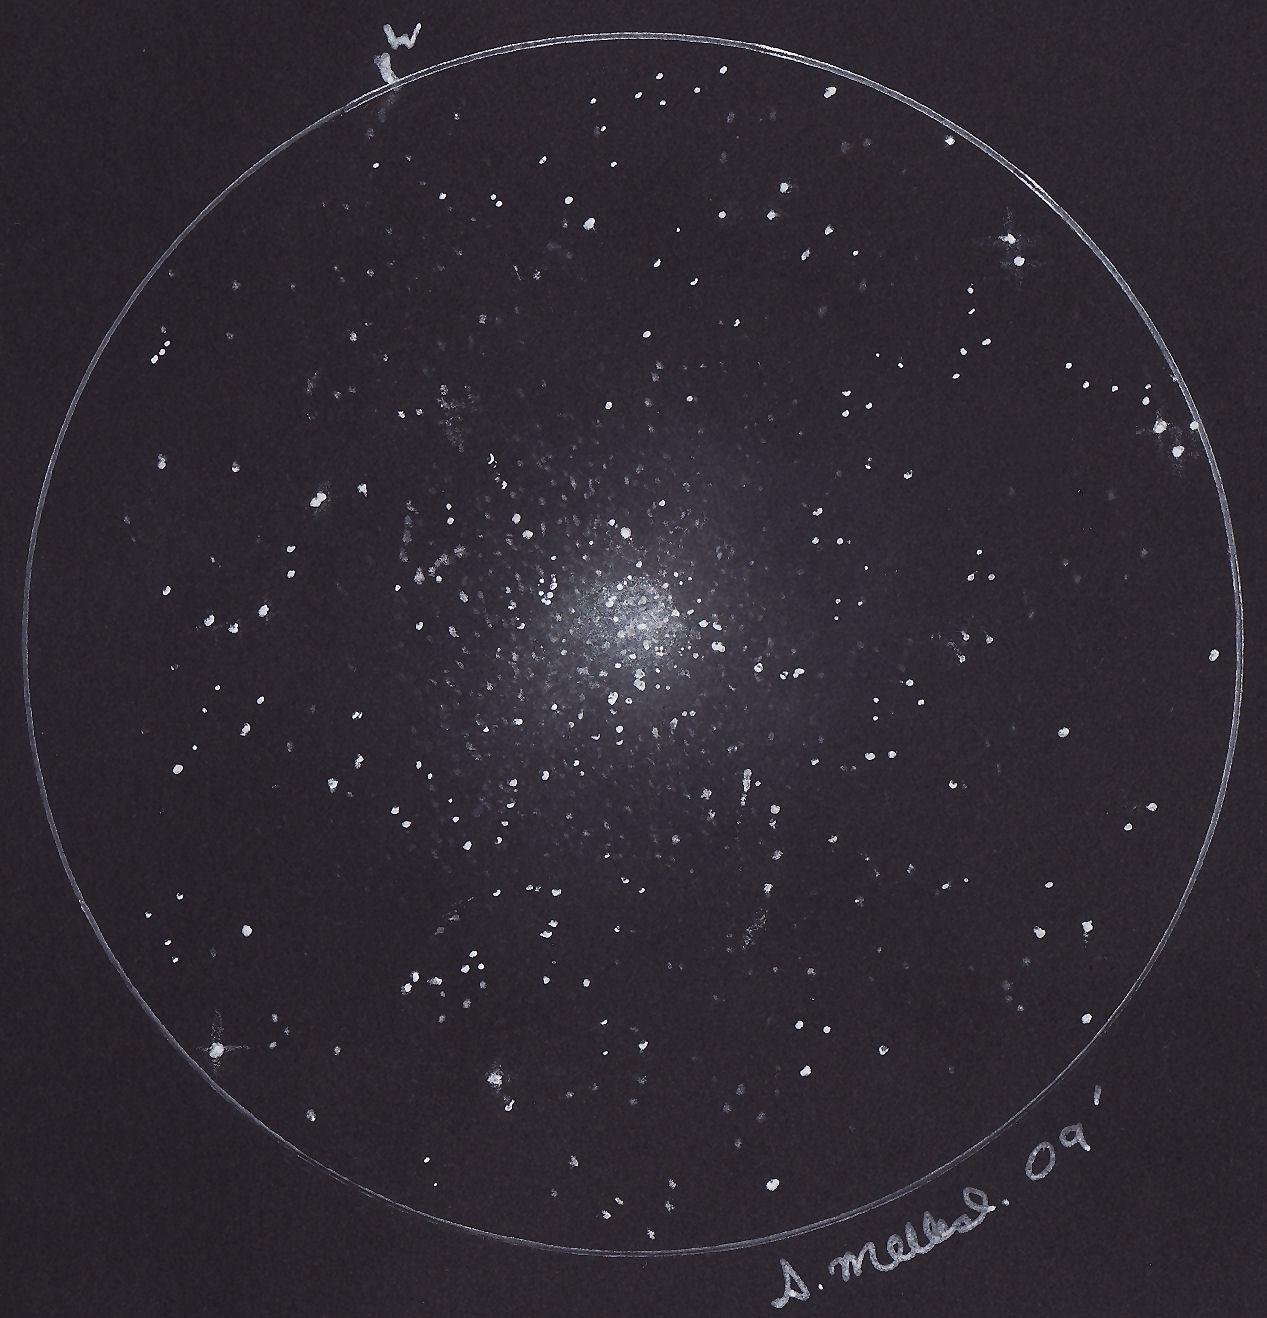 NGC 104/47 Tucanae